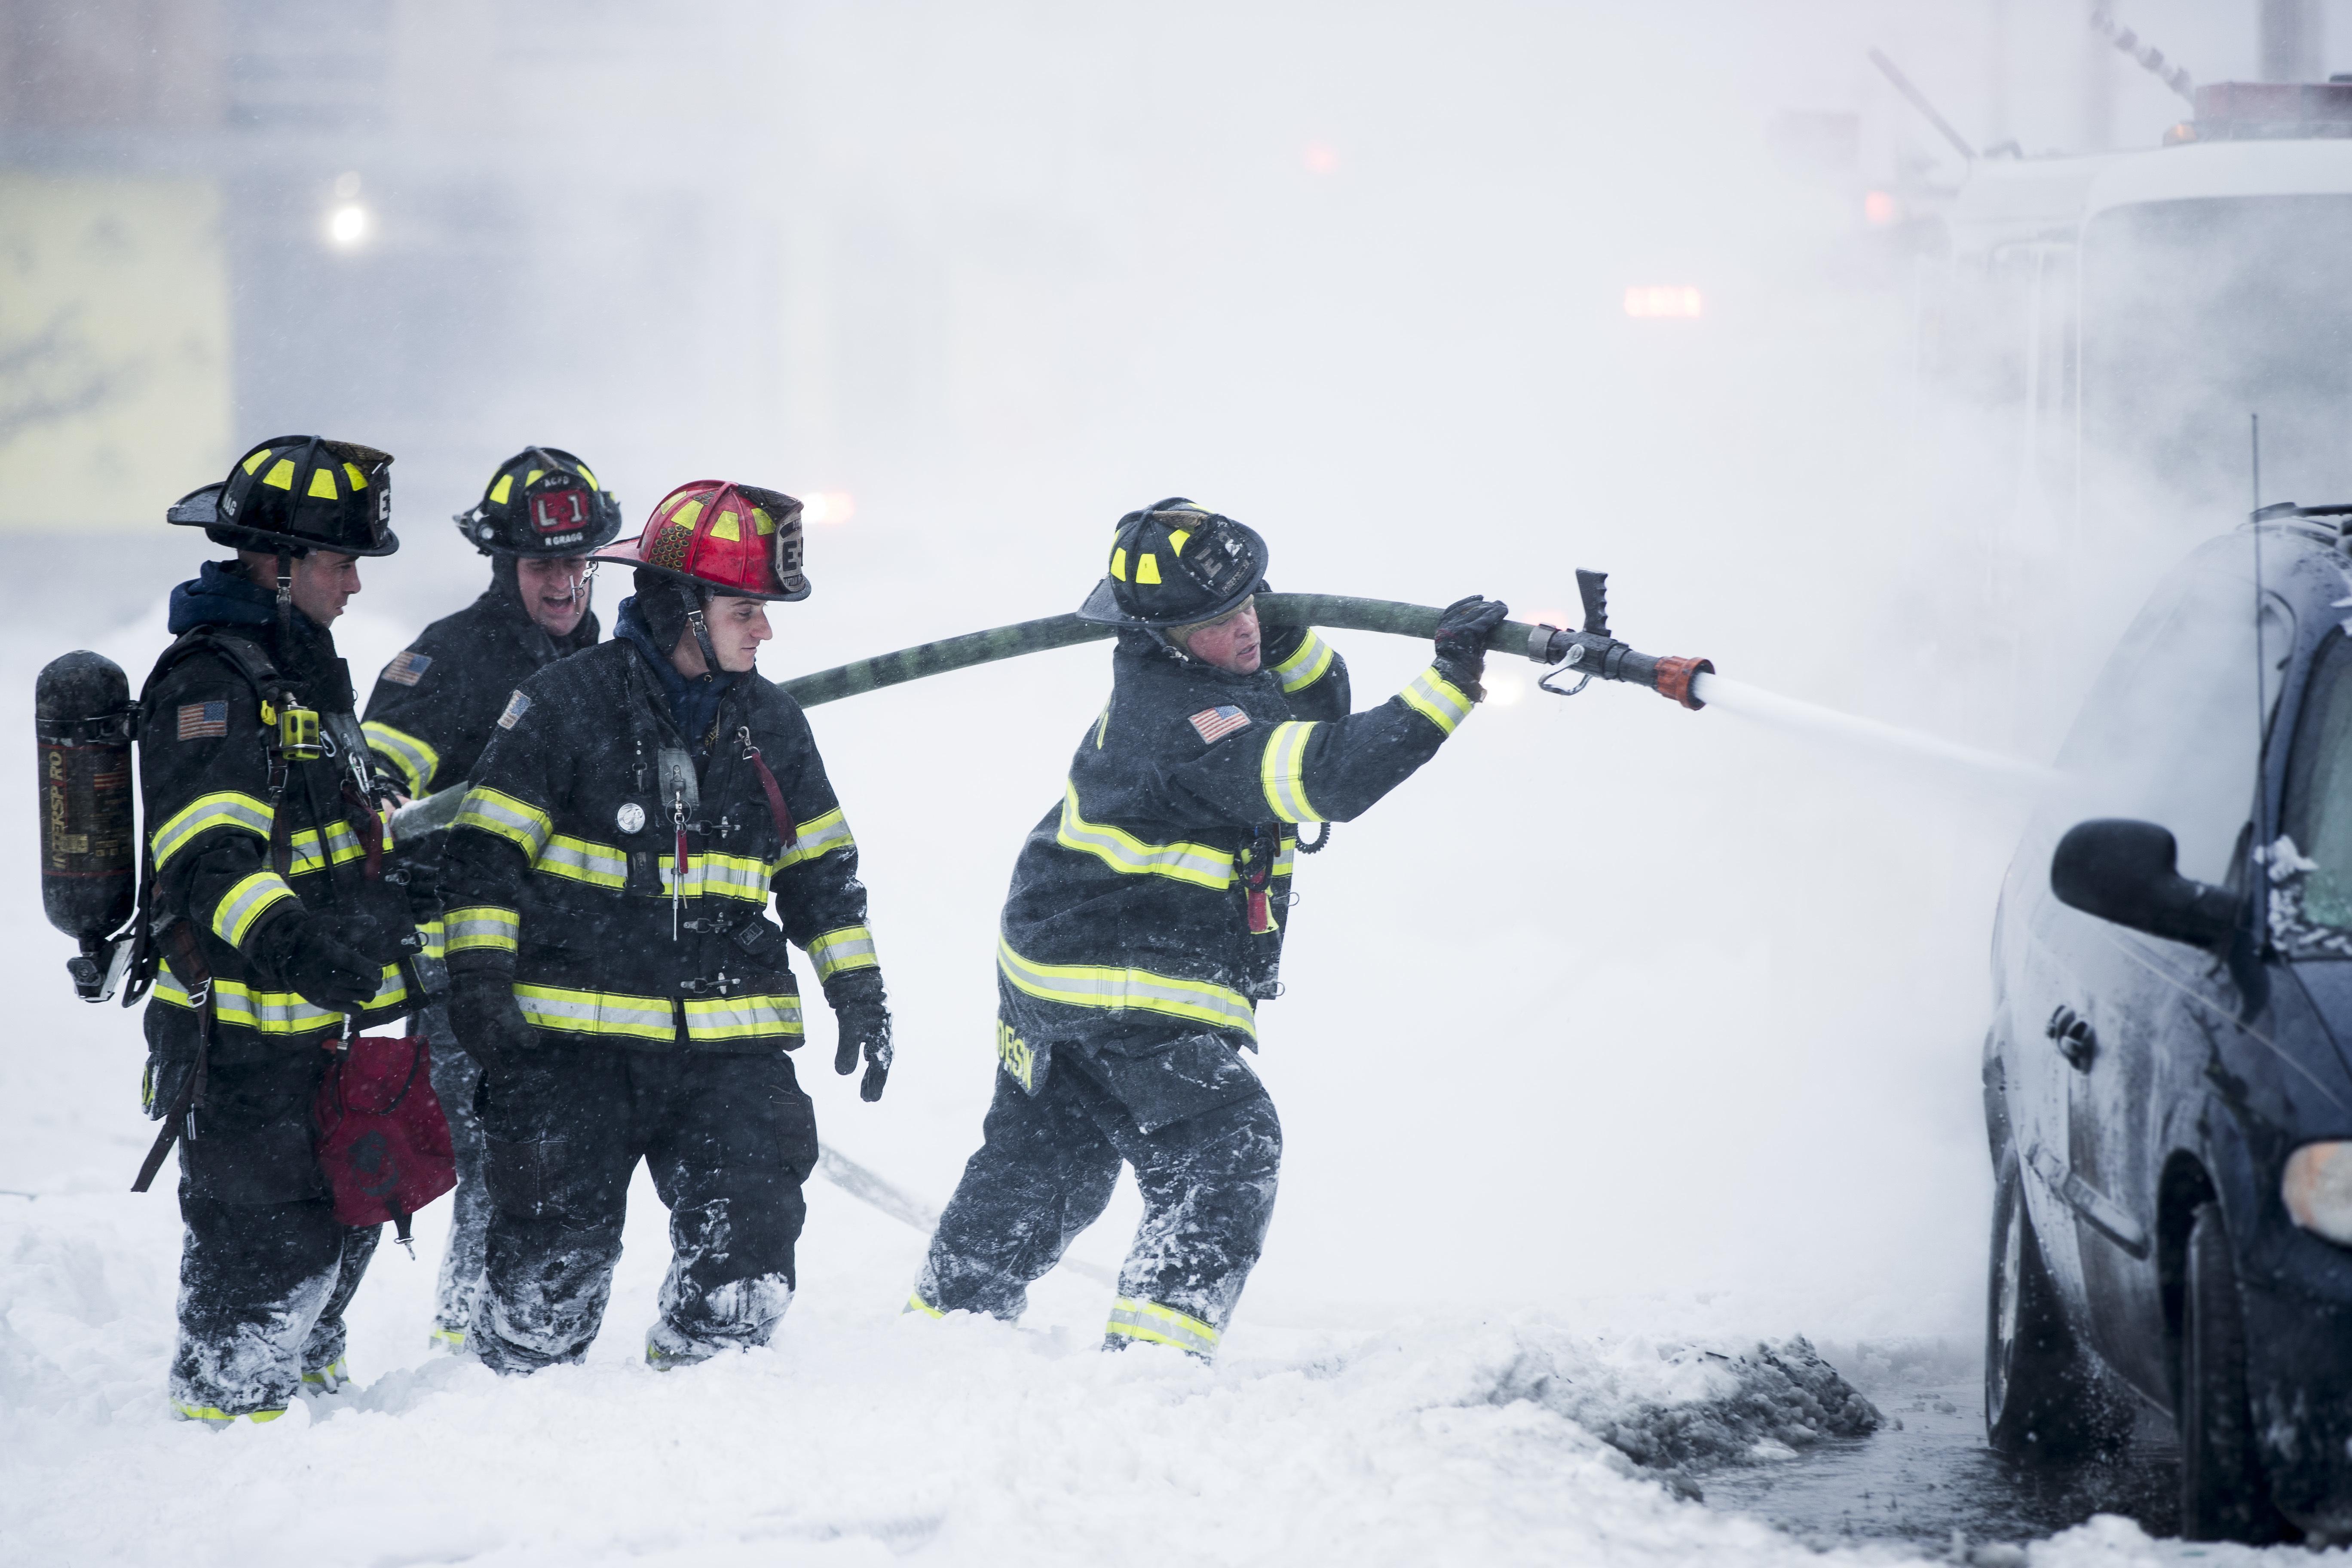 "<div class=""meta image-caption""><div class=""origin-logo origin-image none""><span>none</span></div><span class=""caption-text"">Firefighters extinguish a vehicle fire during a winter snowstorm in Atlantic City, N.J., Thursday, Jan. 4, 2018.  (AP Photo/Matt Rourke) (AP)</span></div>"